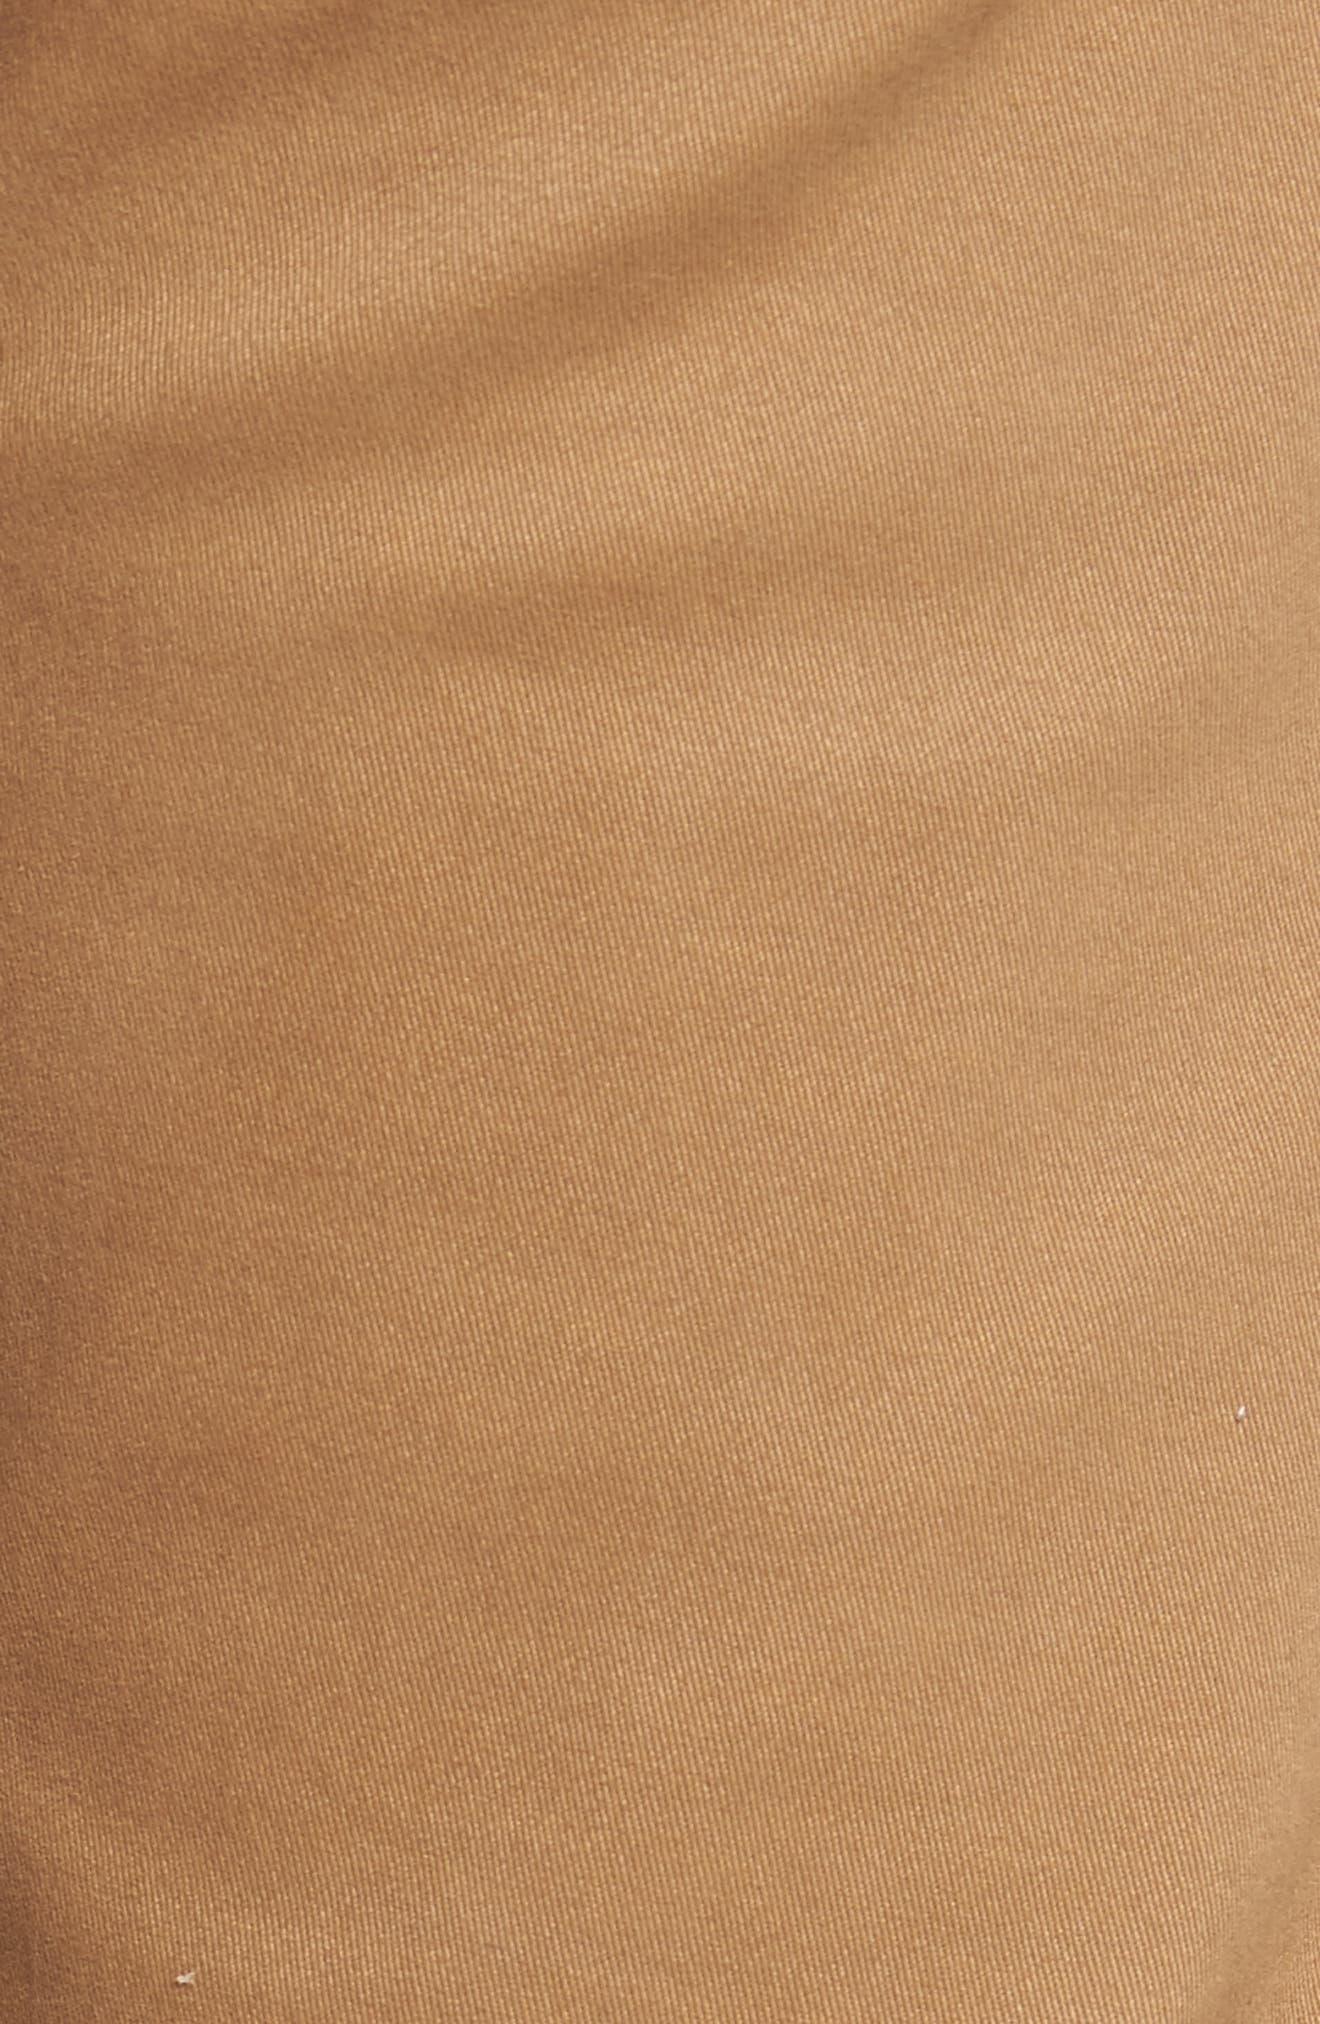 Alternate Image 5  - Peter Millar Perfect Twill 5-Pocket Pants